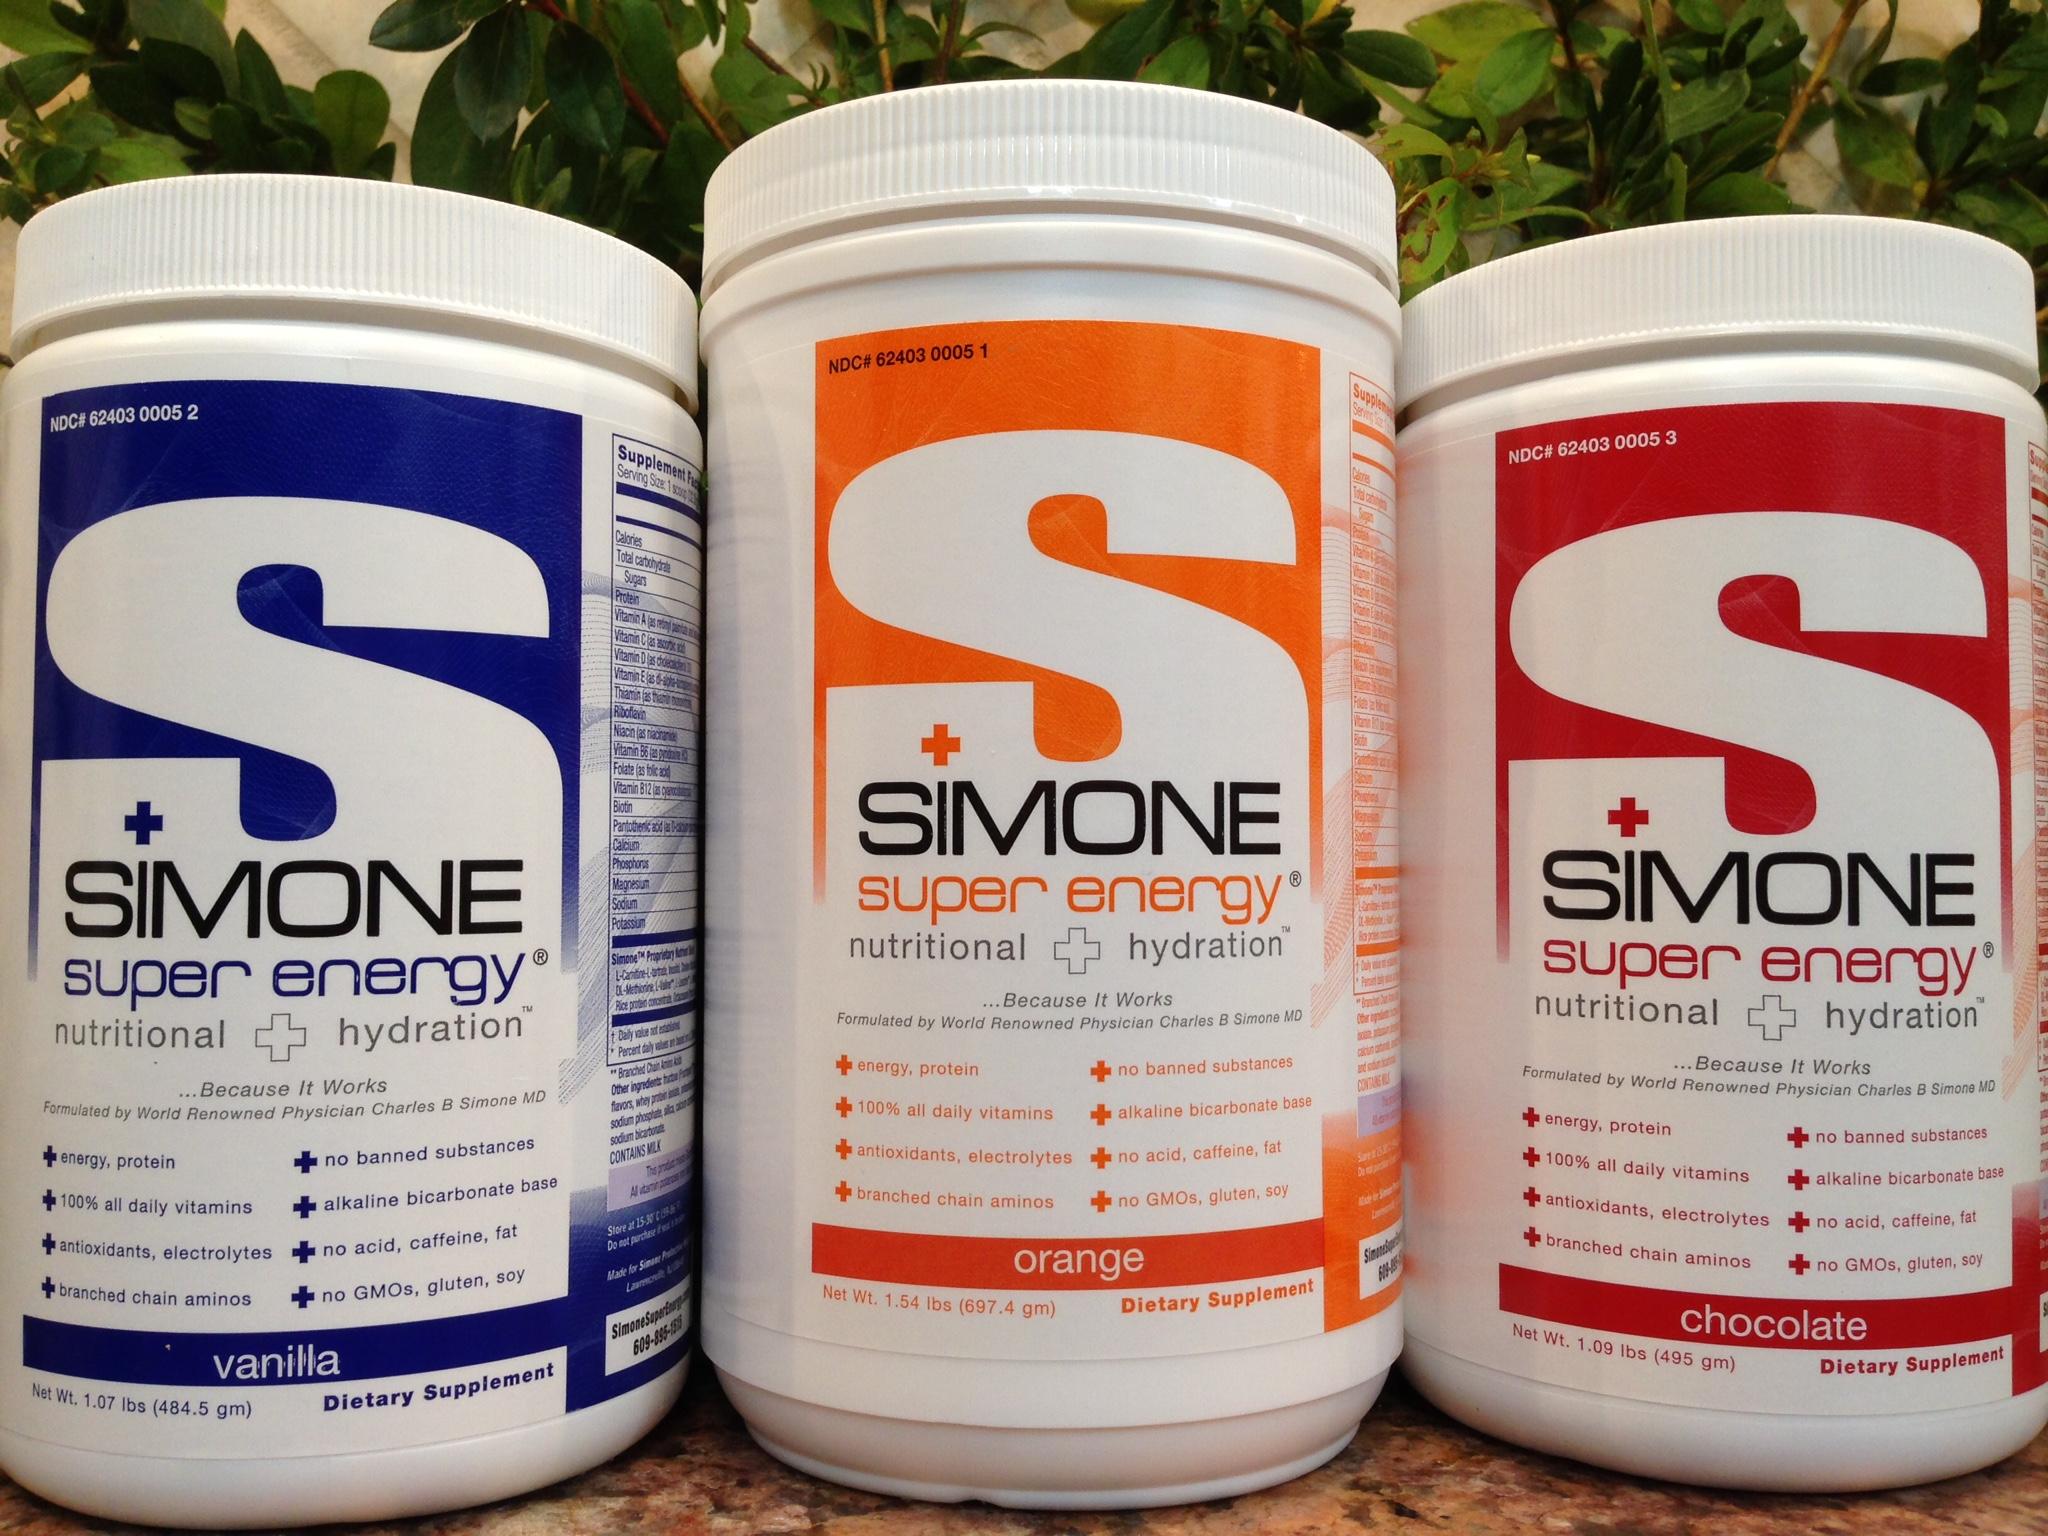 …. So Did SIMONE SUPER ENERGY Patented Formula